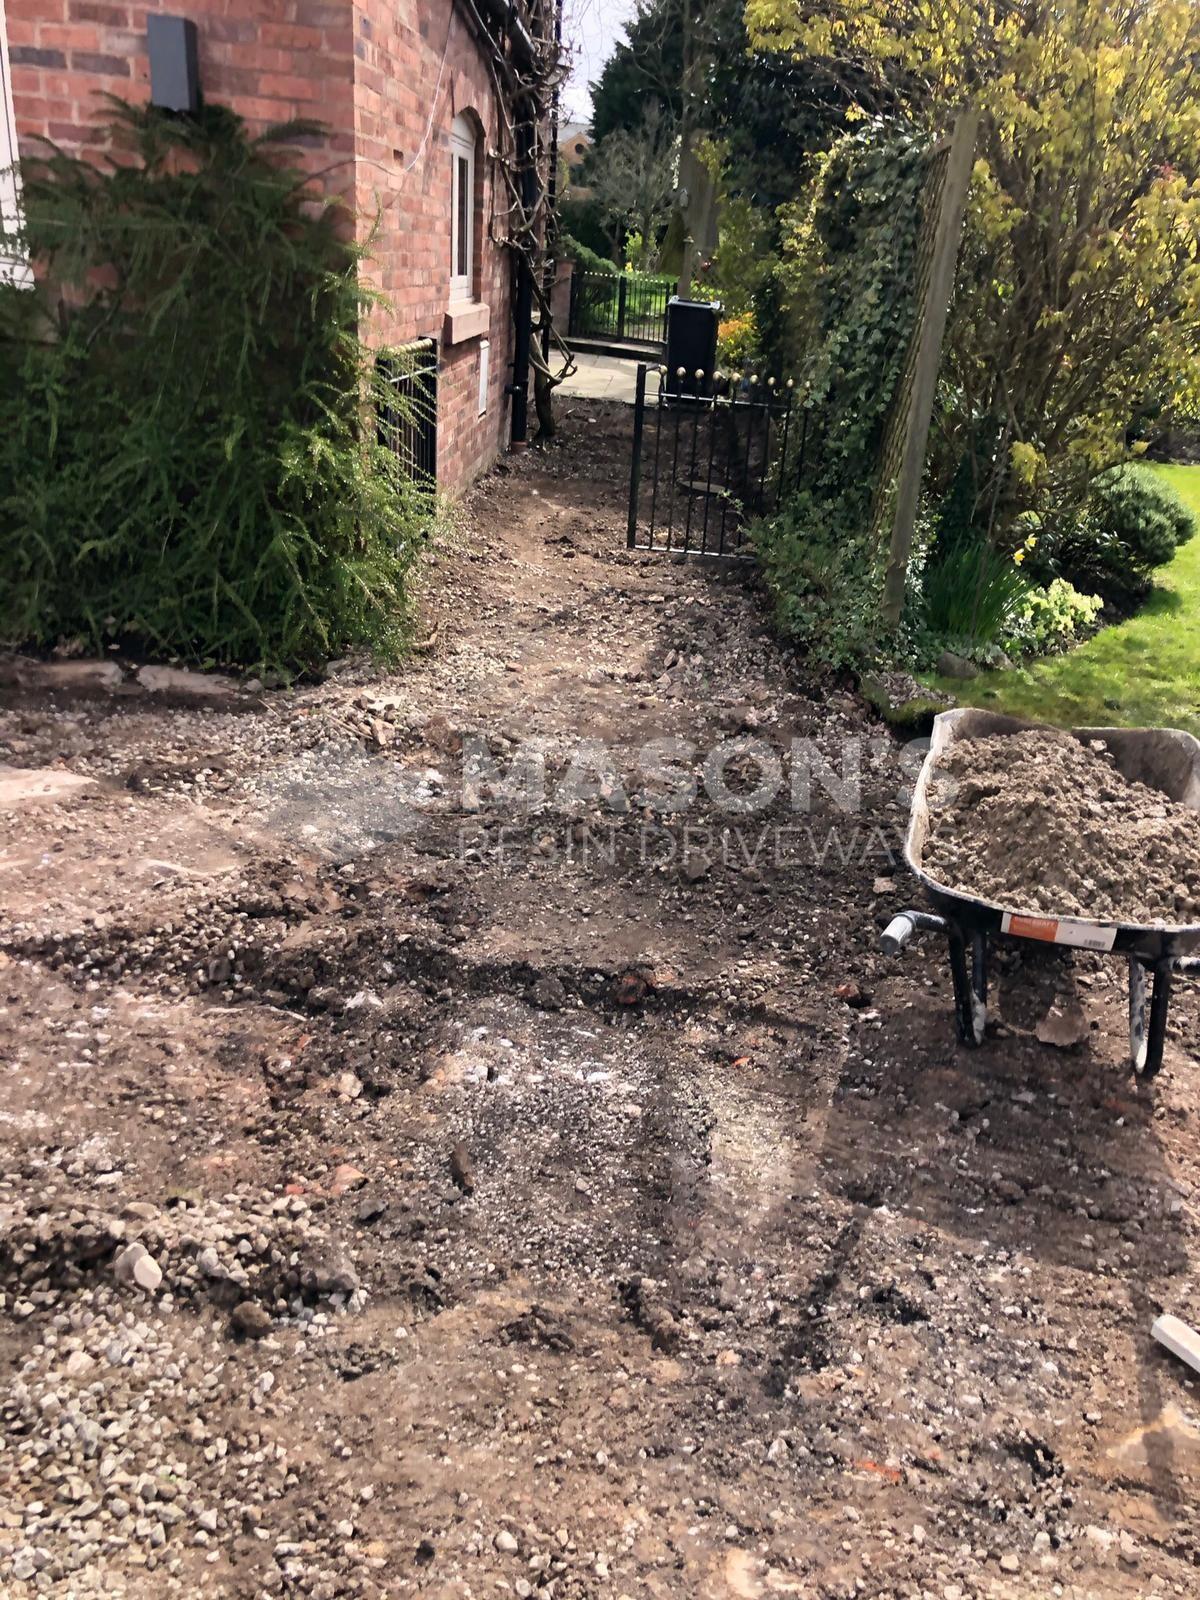 ground dug up for driveway installation